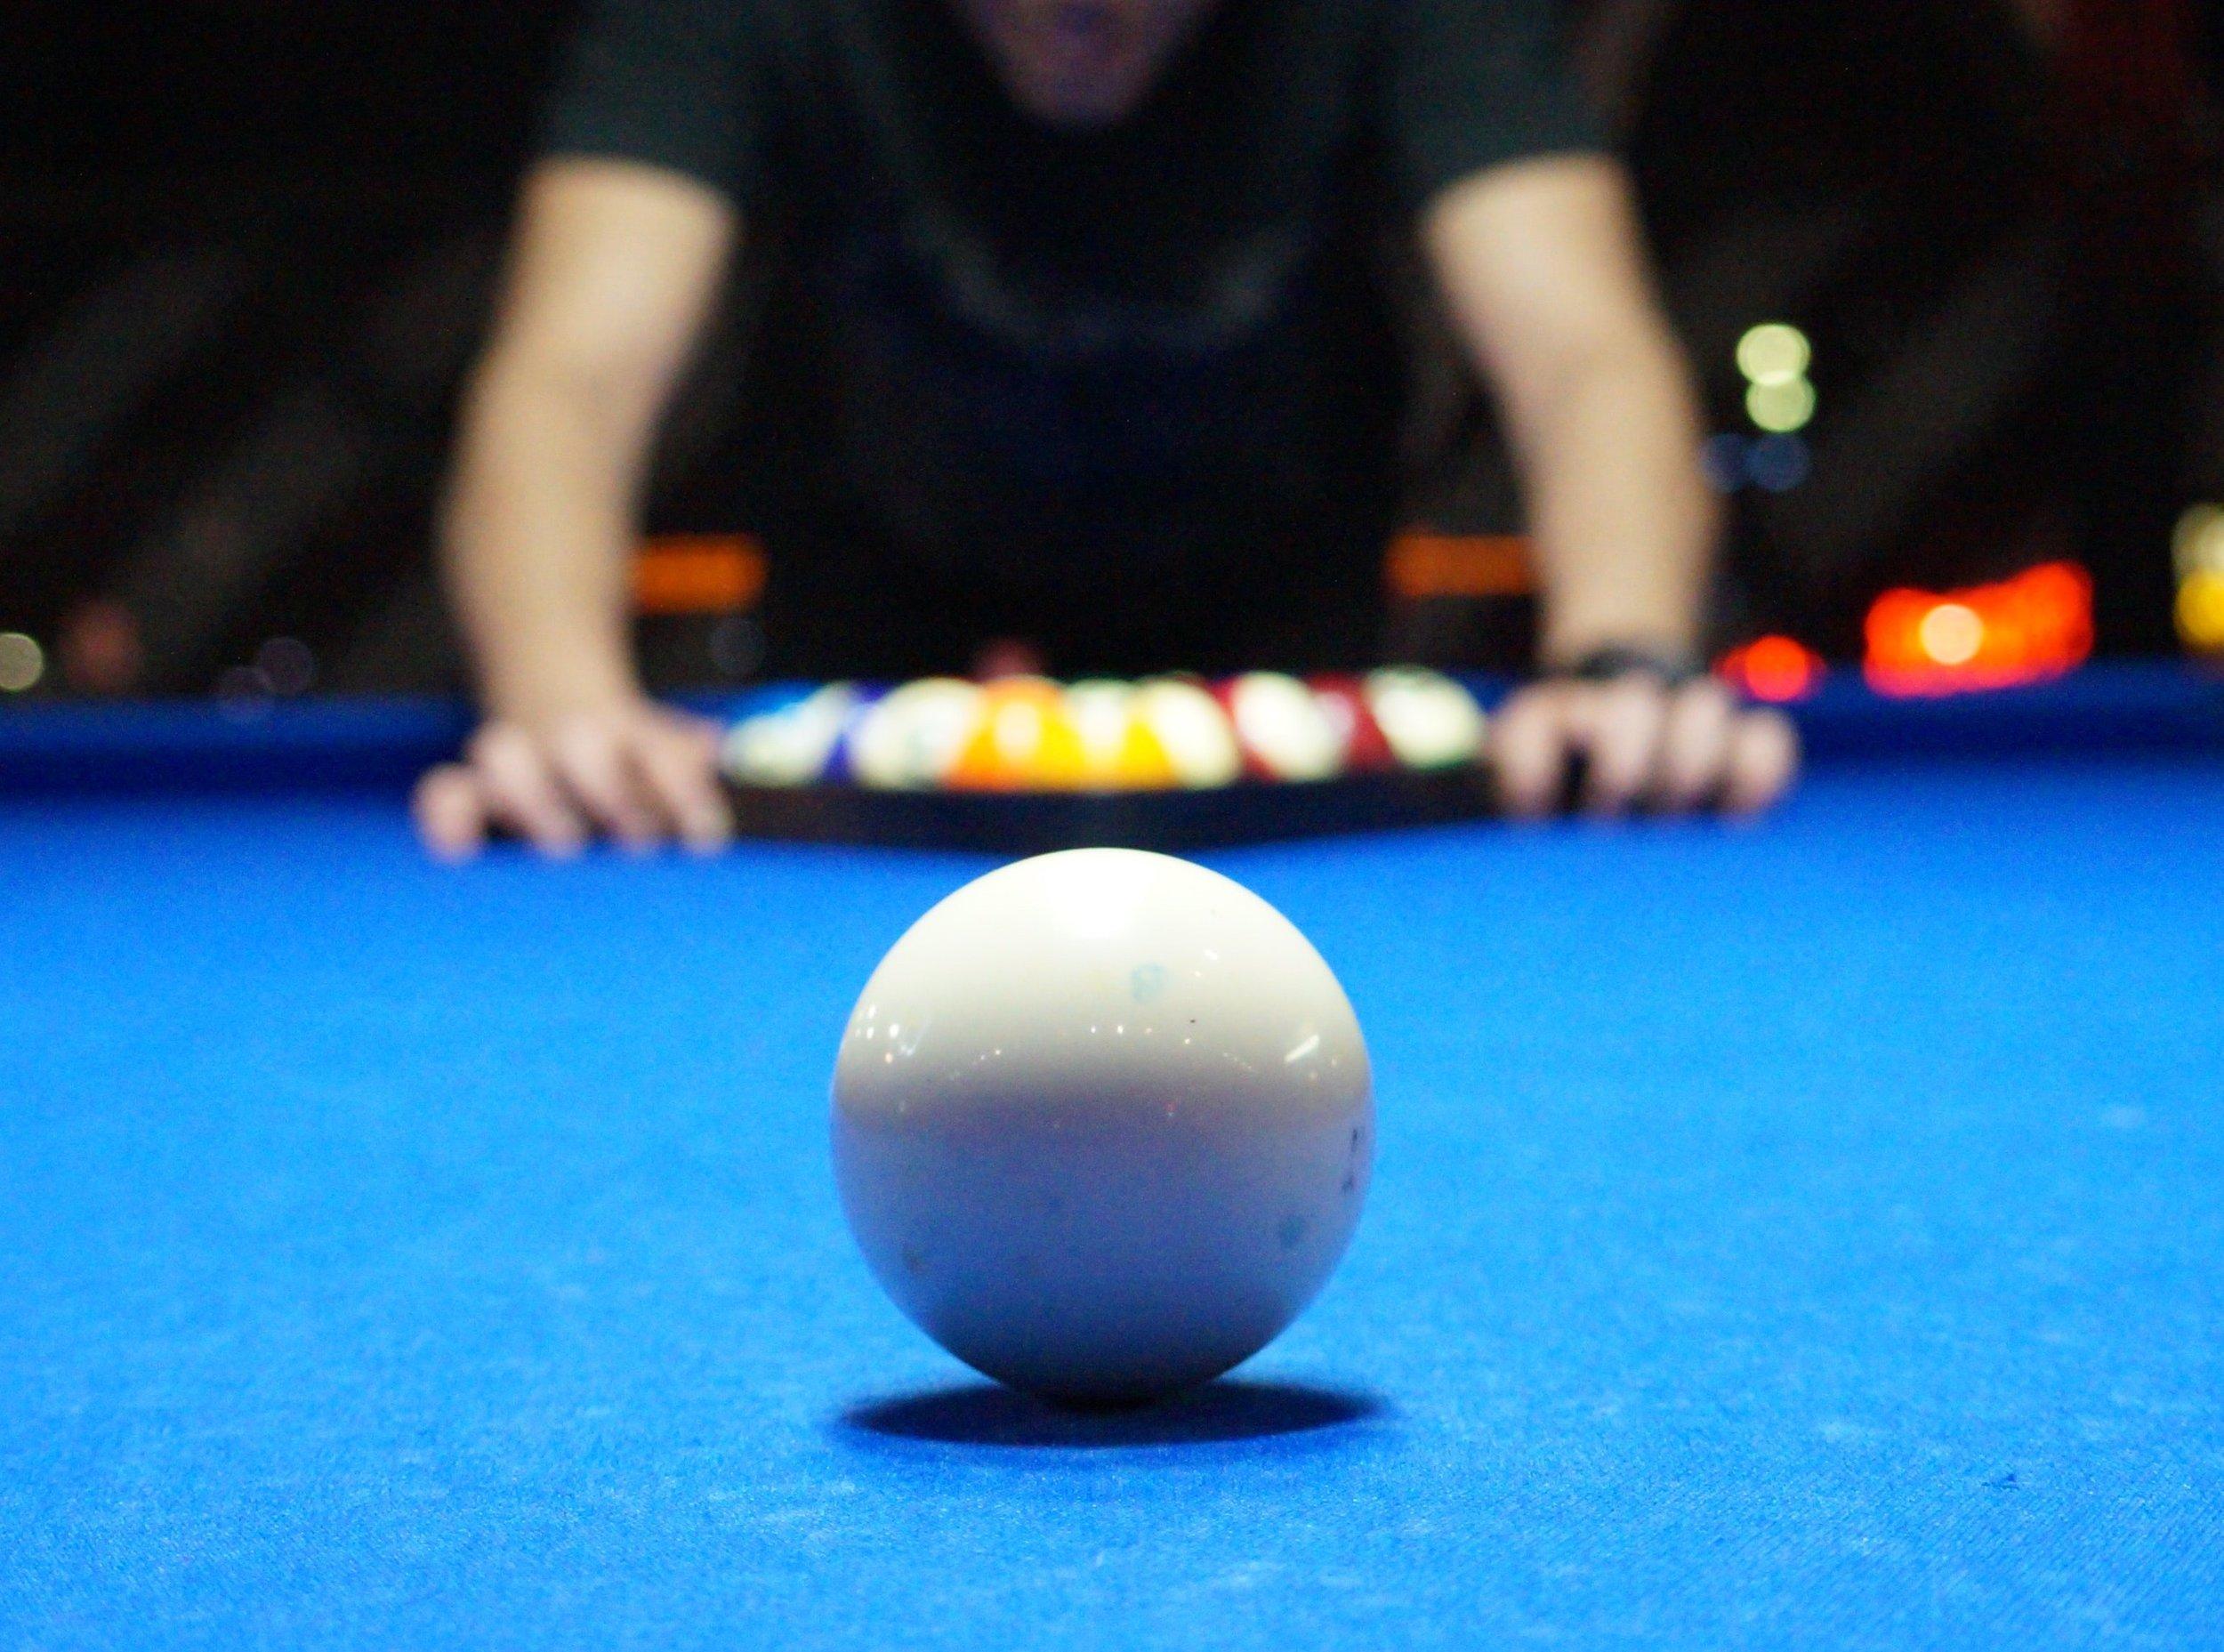 CueMaster_poolSchool_Billiards.jpg